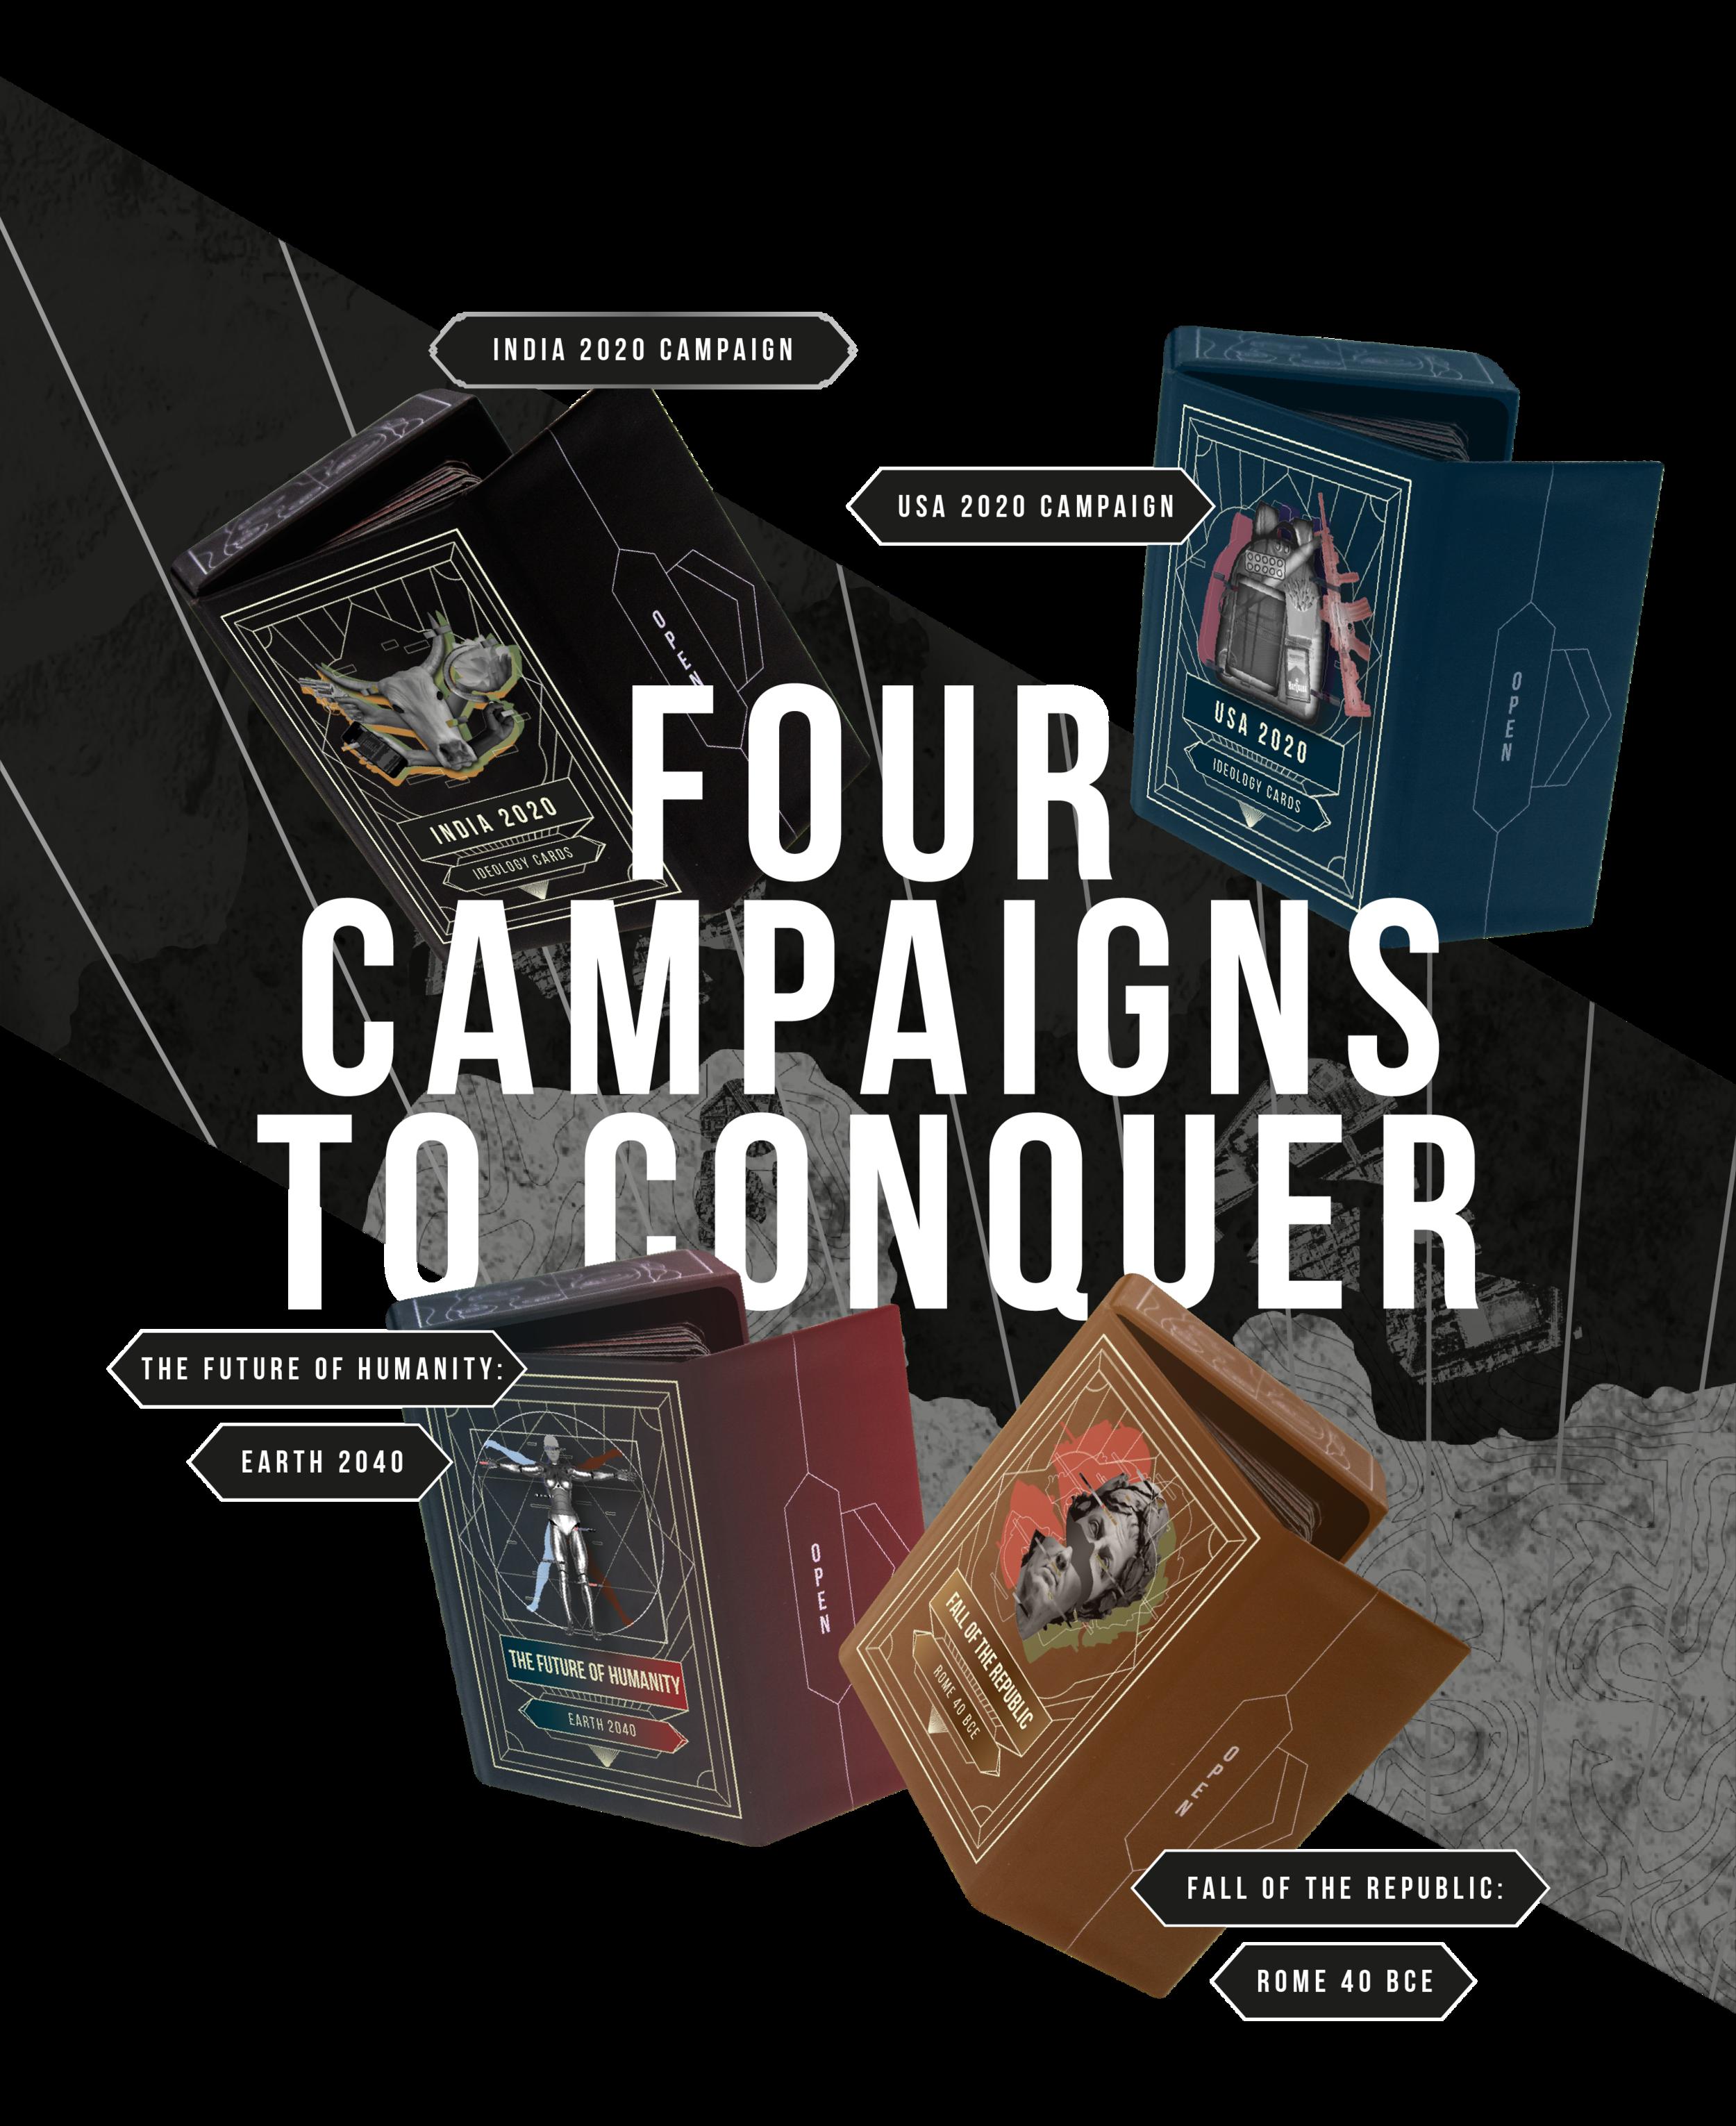 Shasn_Kickstarter Campaign_R15-29.png